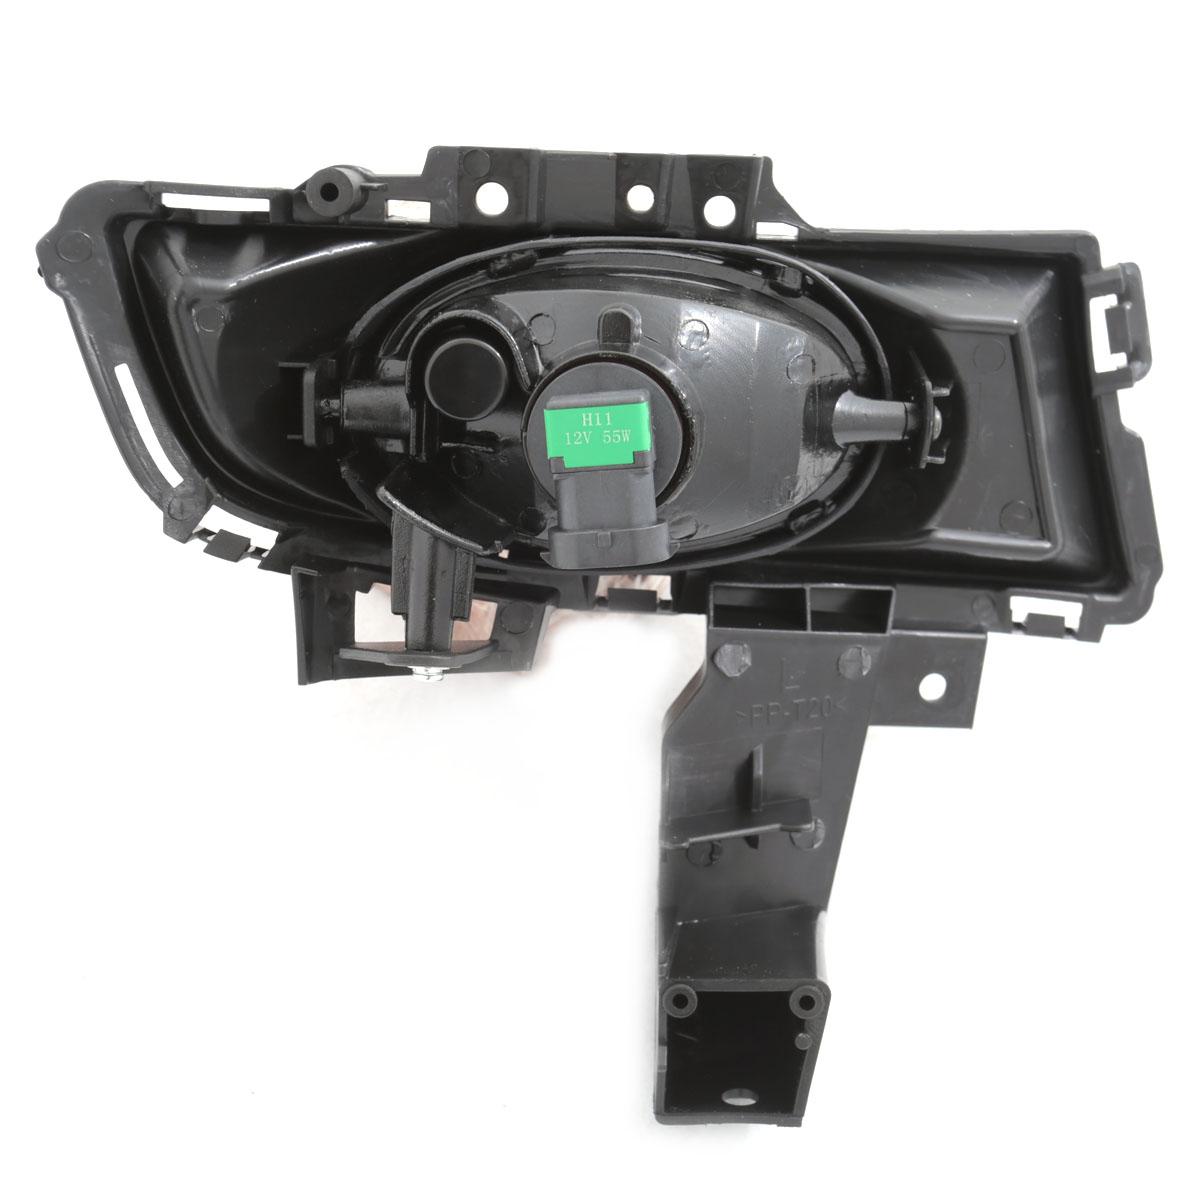 2008 Mazda 3 Headlight Wiring Diagram